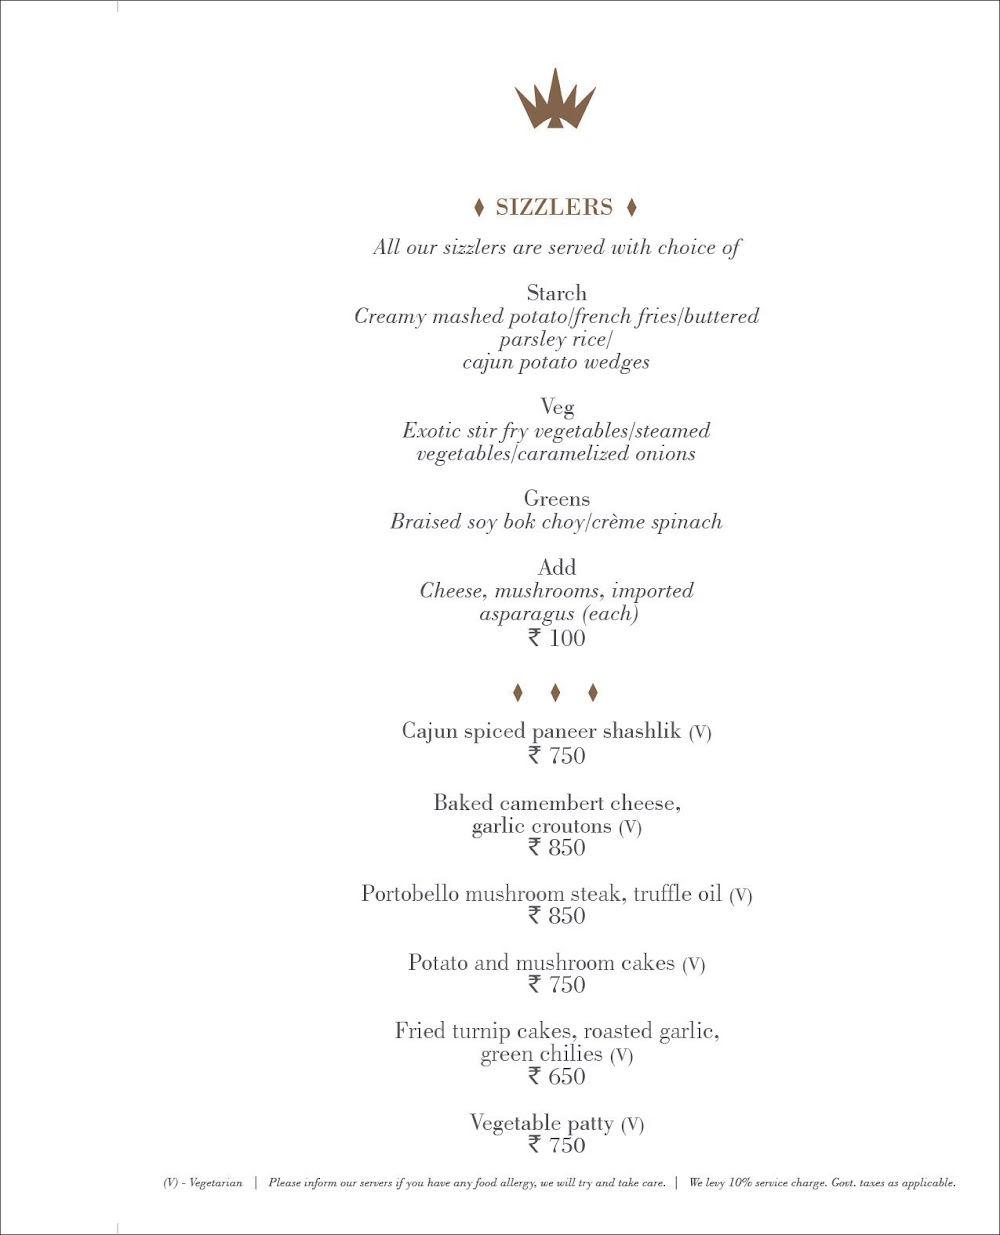 Pranzi menu 13